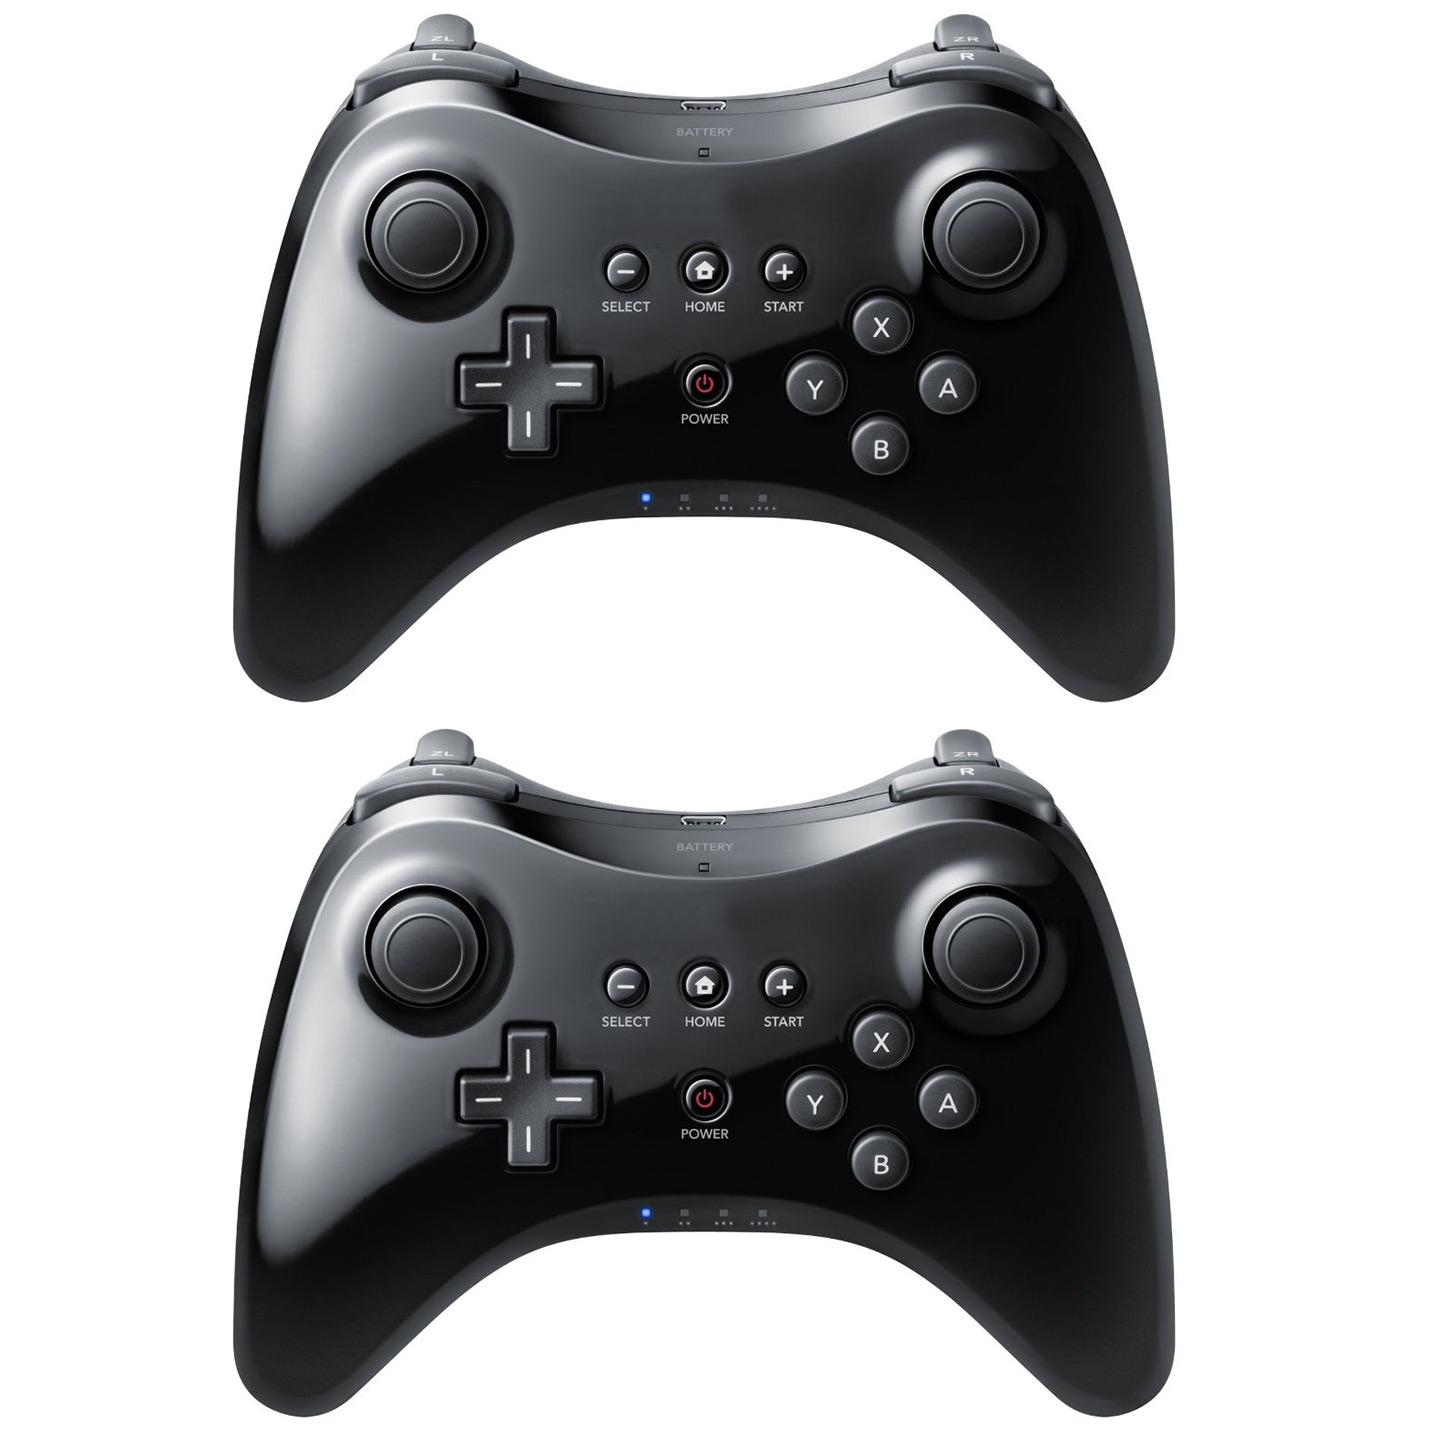 2 Black High Quality U Pro Bluetooth Wireless Controller for Nintendo Wii U